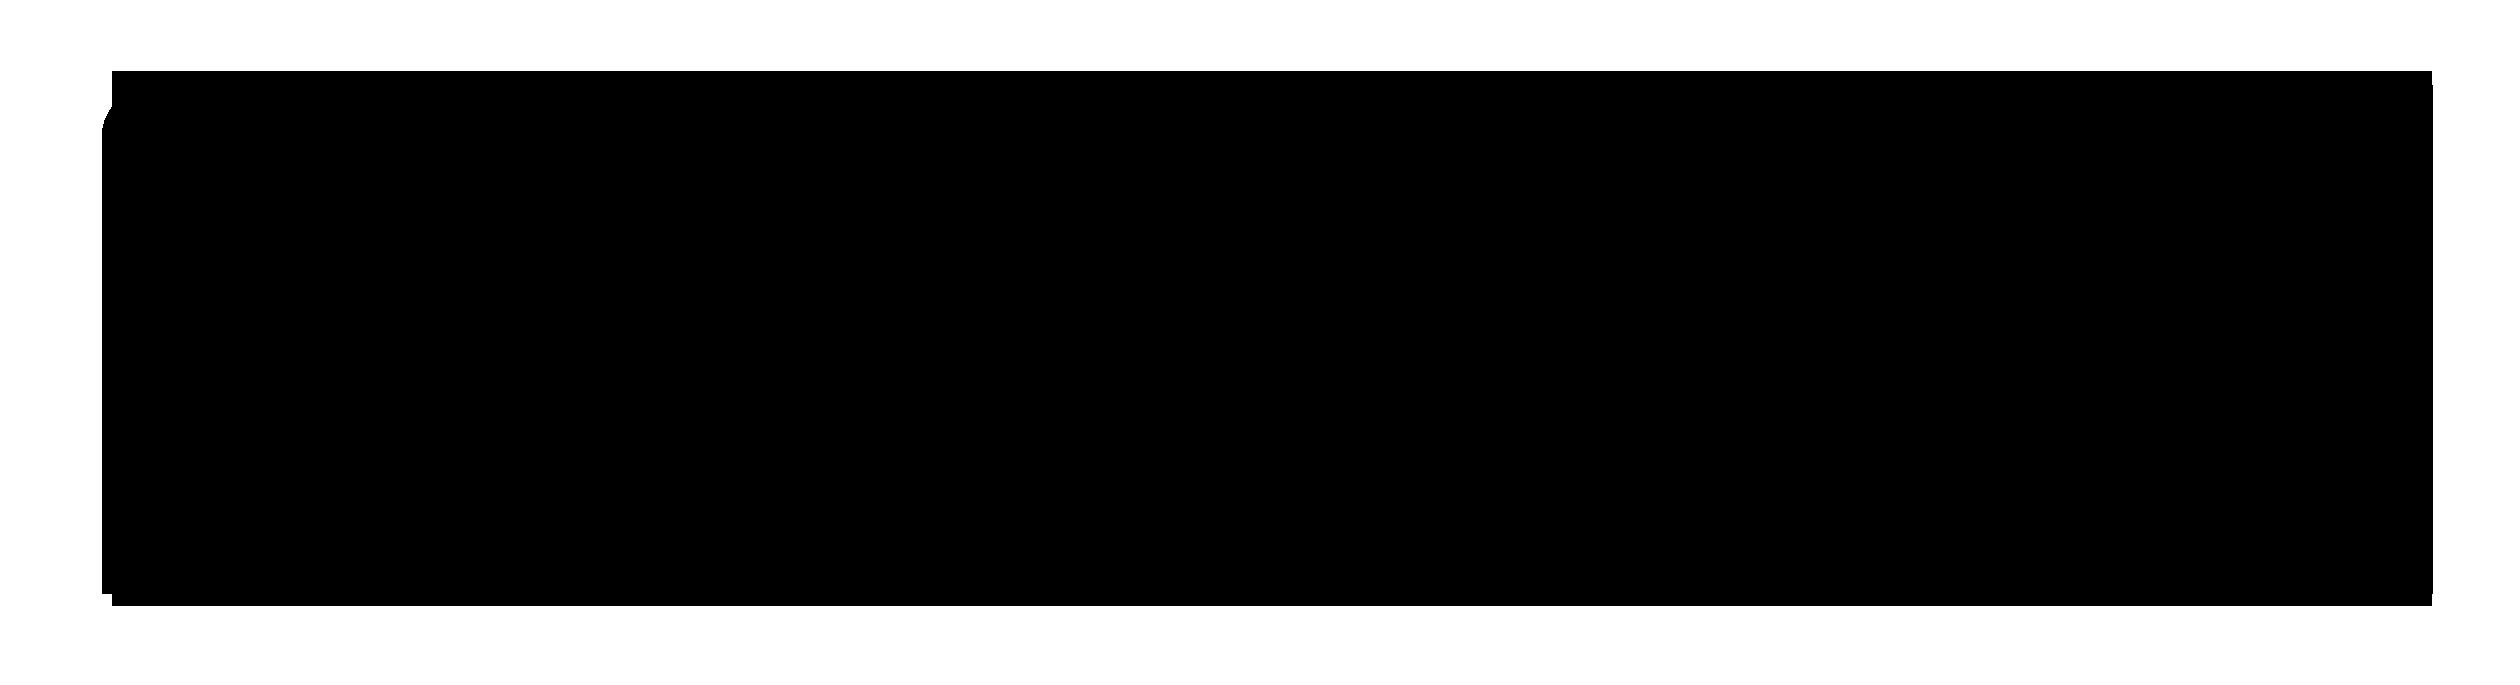 HOF - fusion_logo_black.png